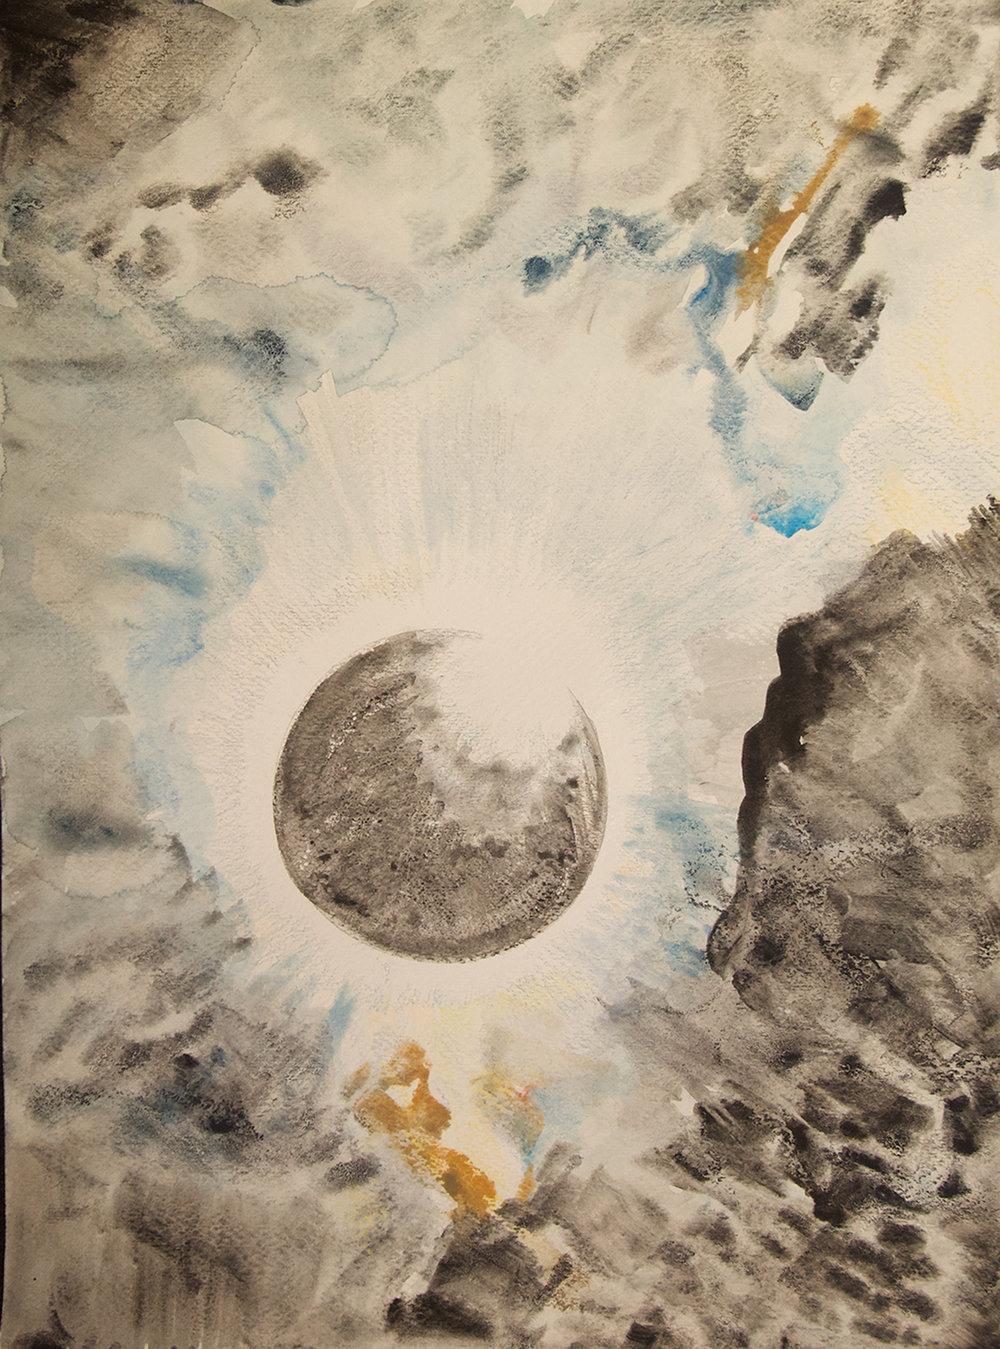 "Diamond Ring, Receding   Watercolor, crayon, pencil on Arches  22"" x 28""  SOLD"